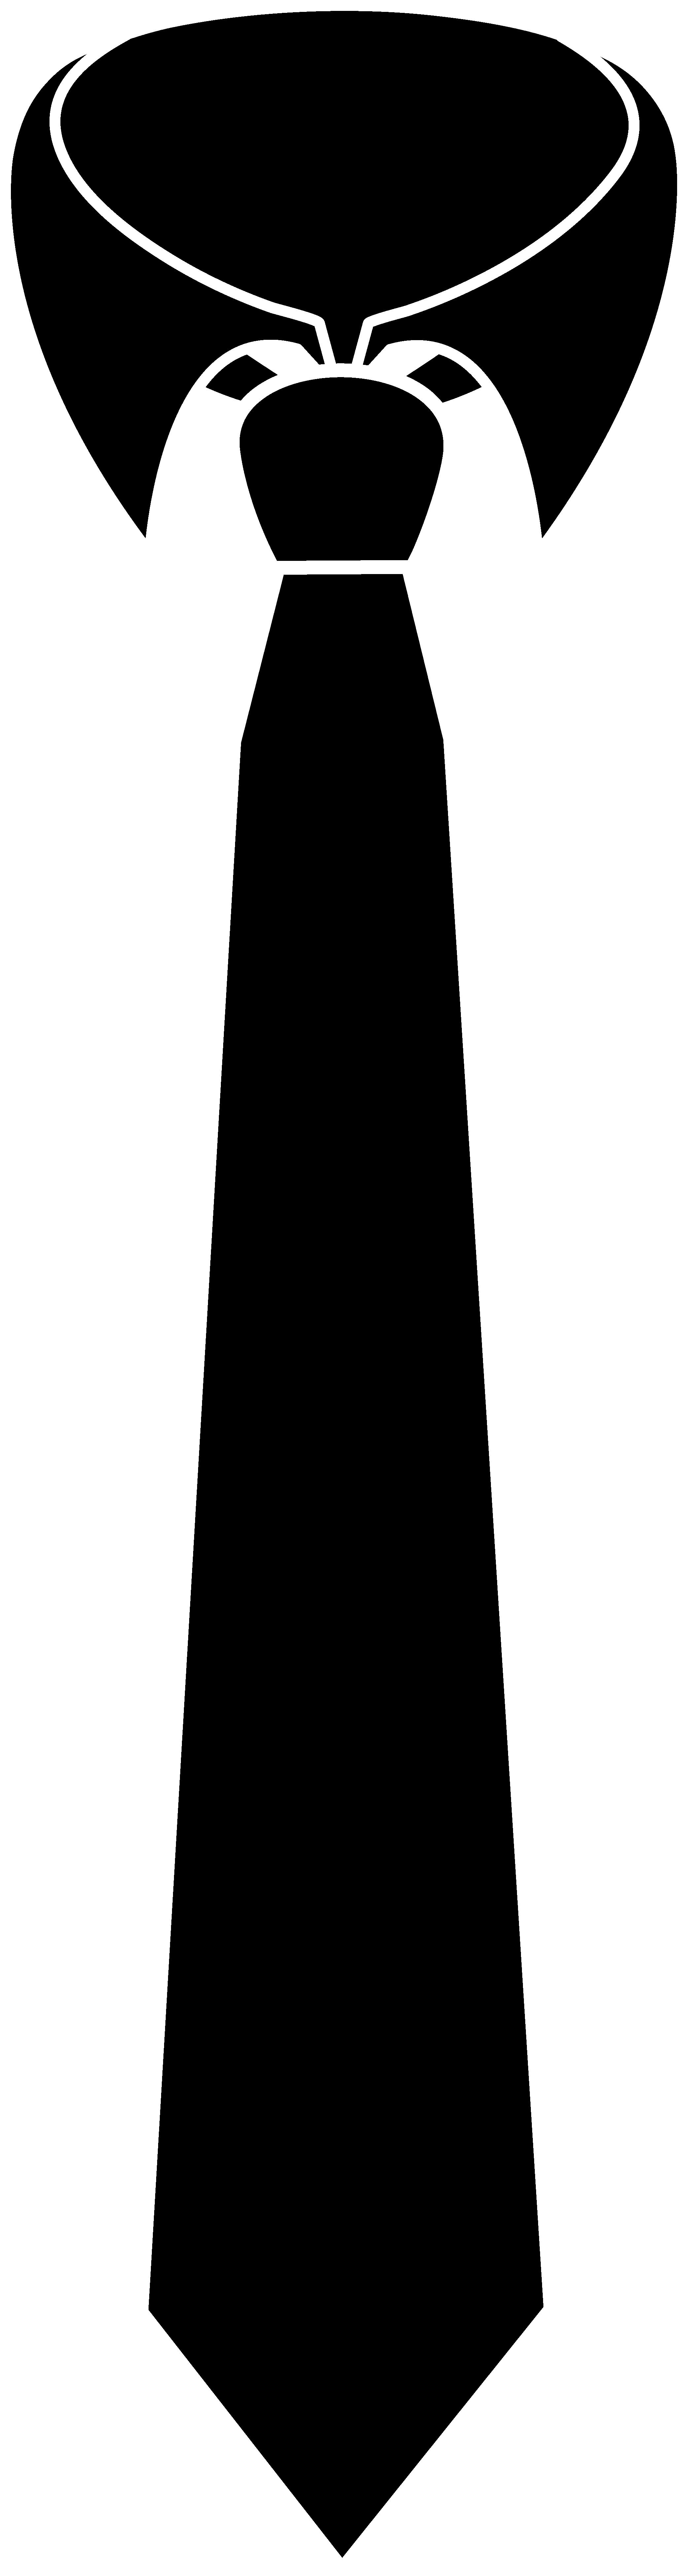 Tuxedo Tie Clipart - Gallery